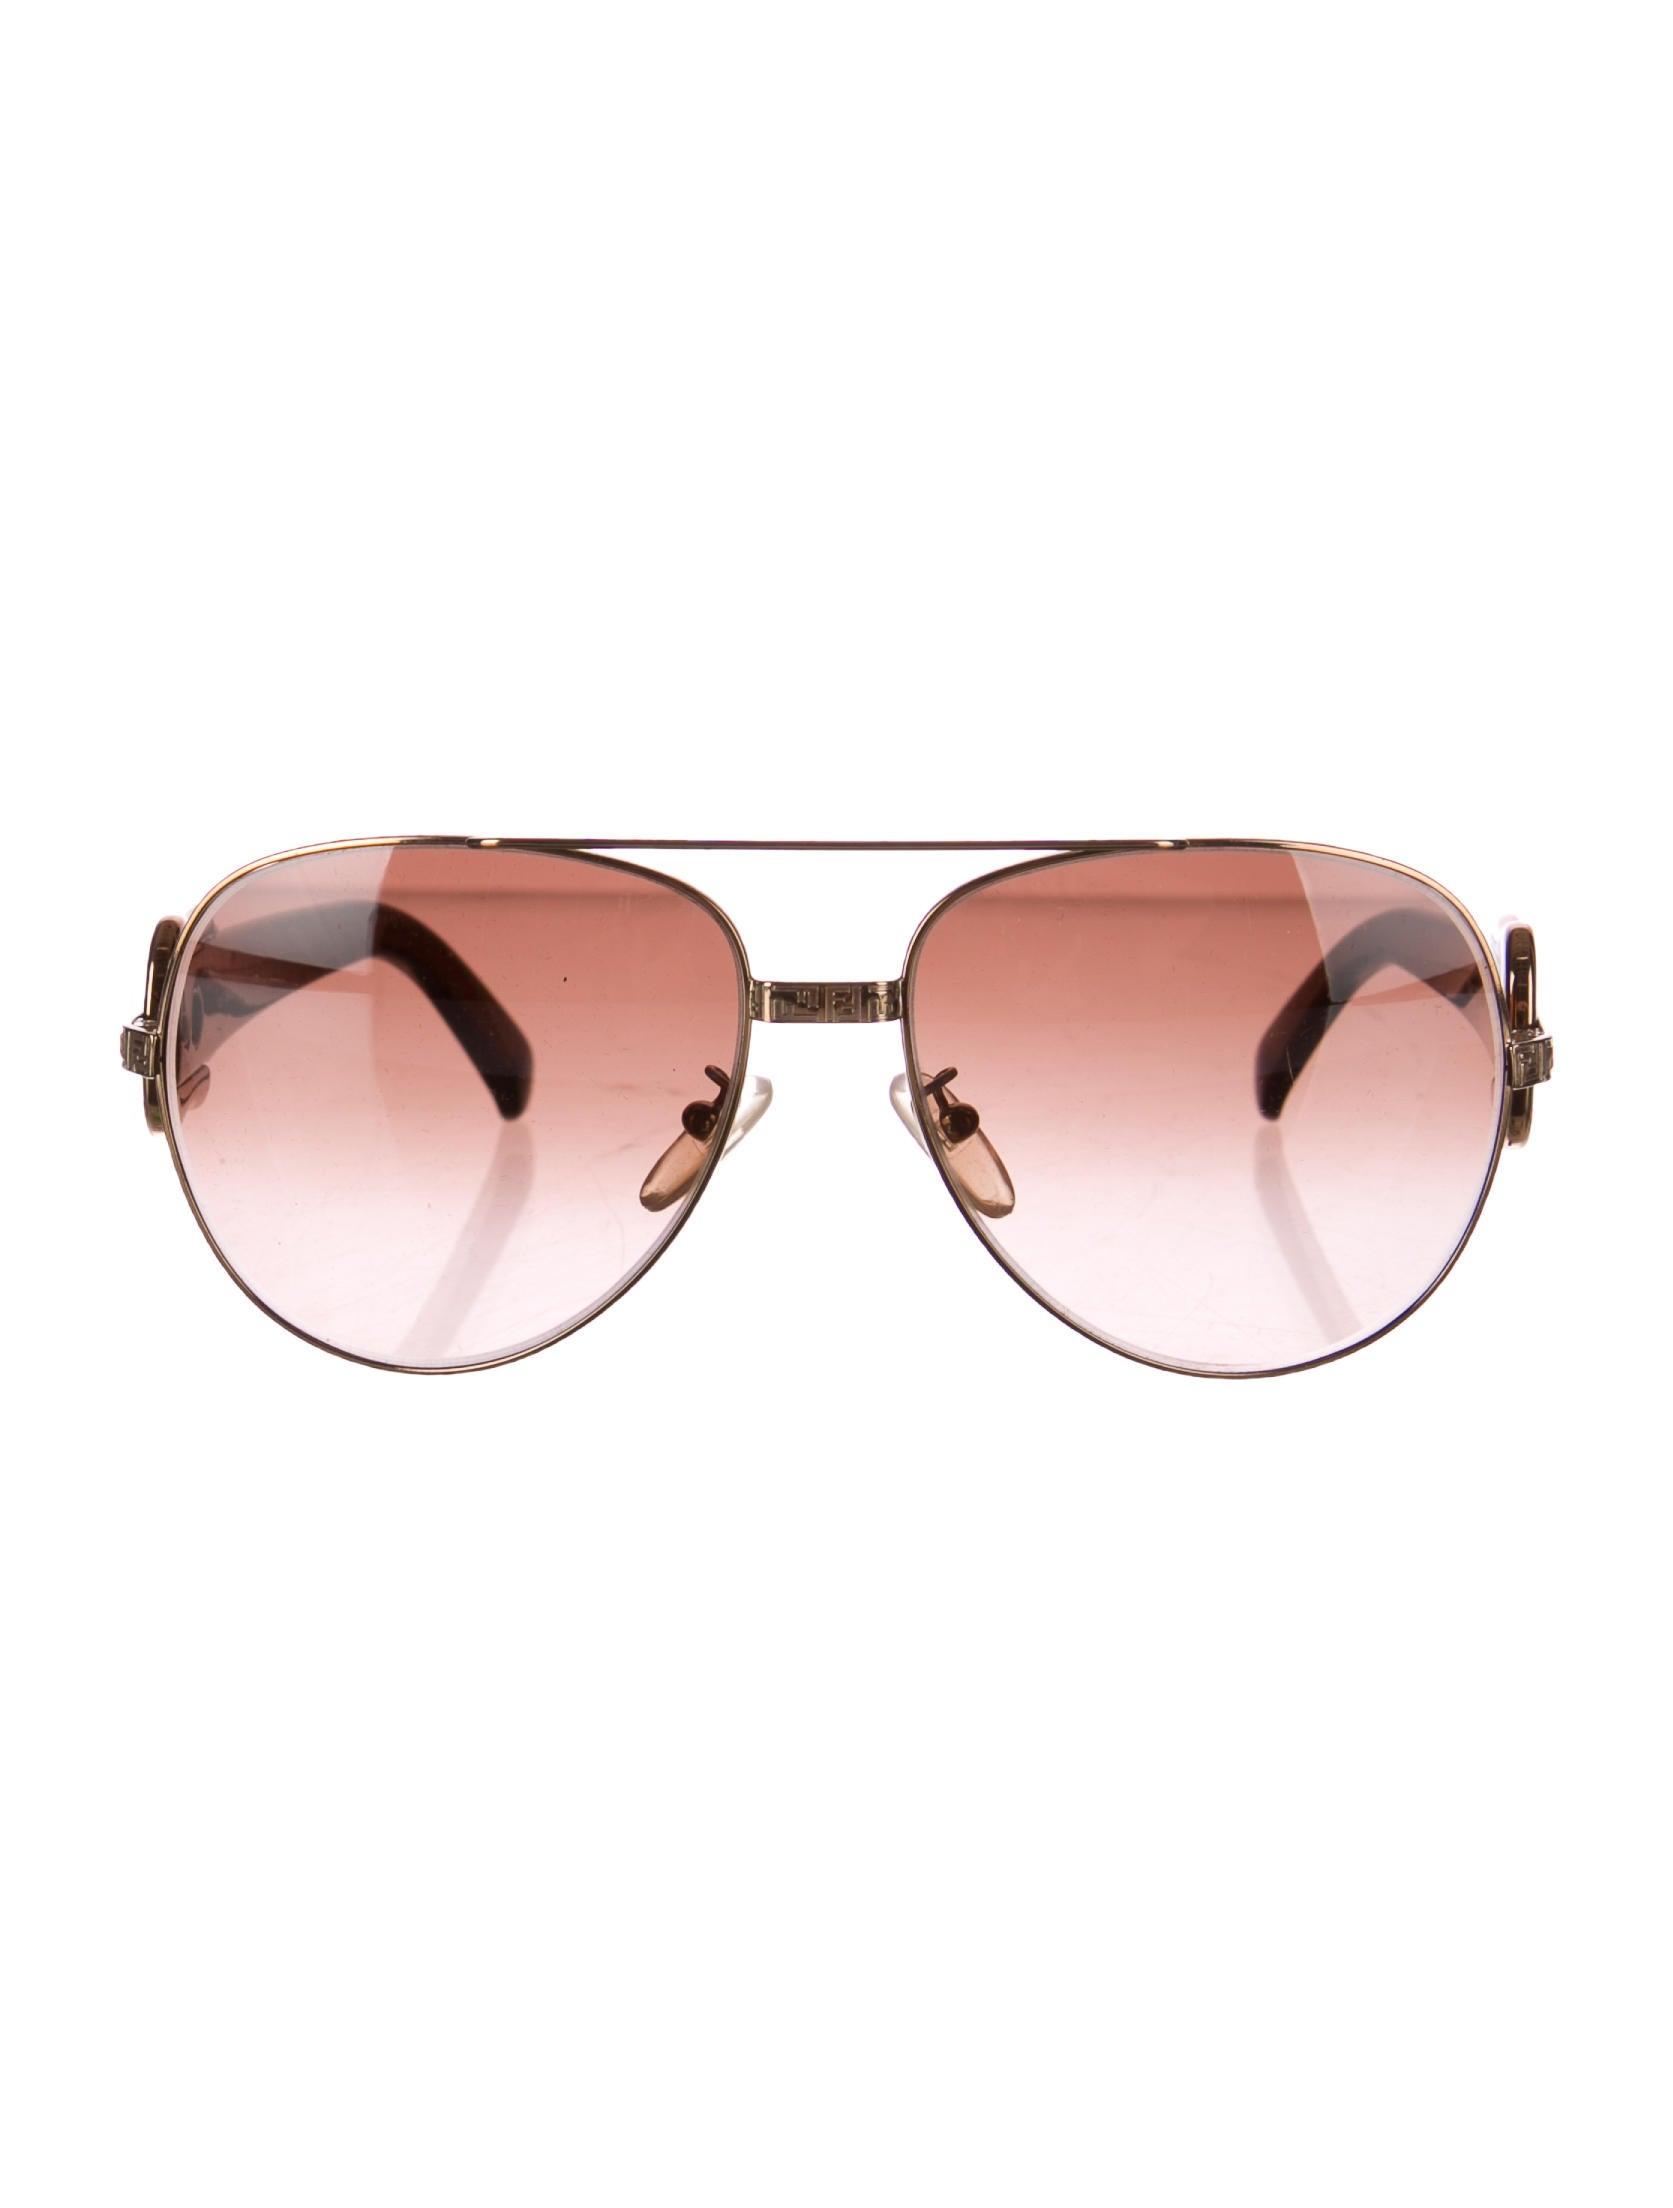 964cf34300473 Mens Fendi Aviator Sunglasses